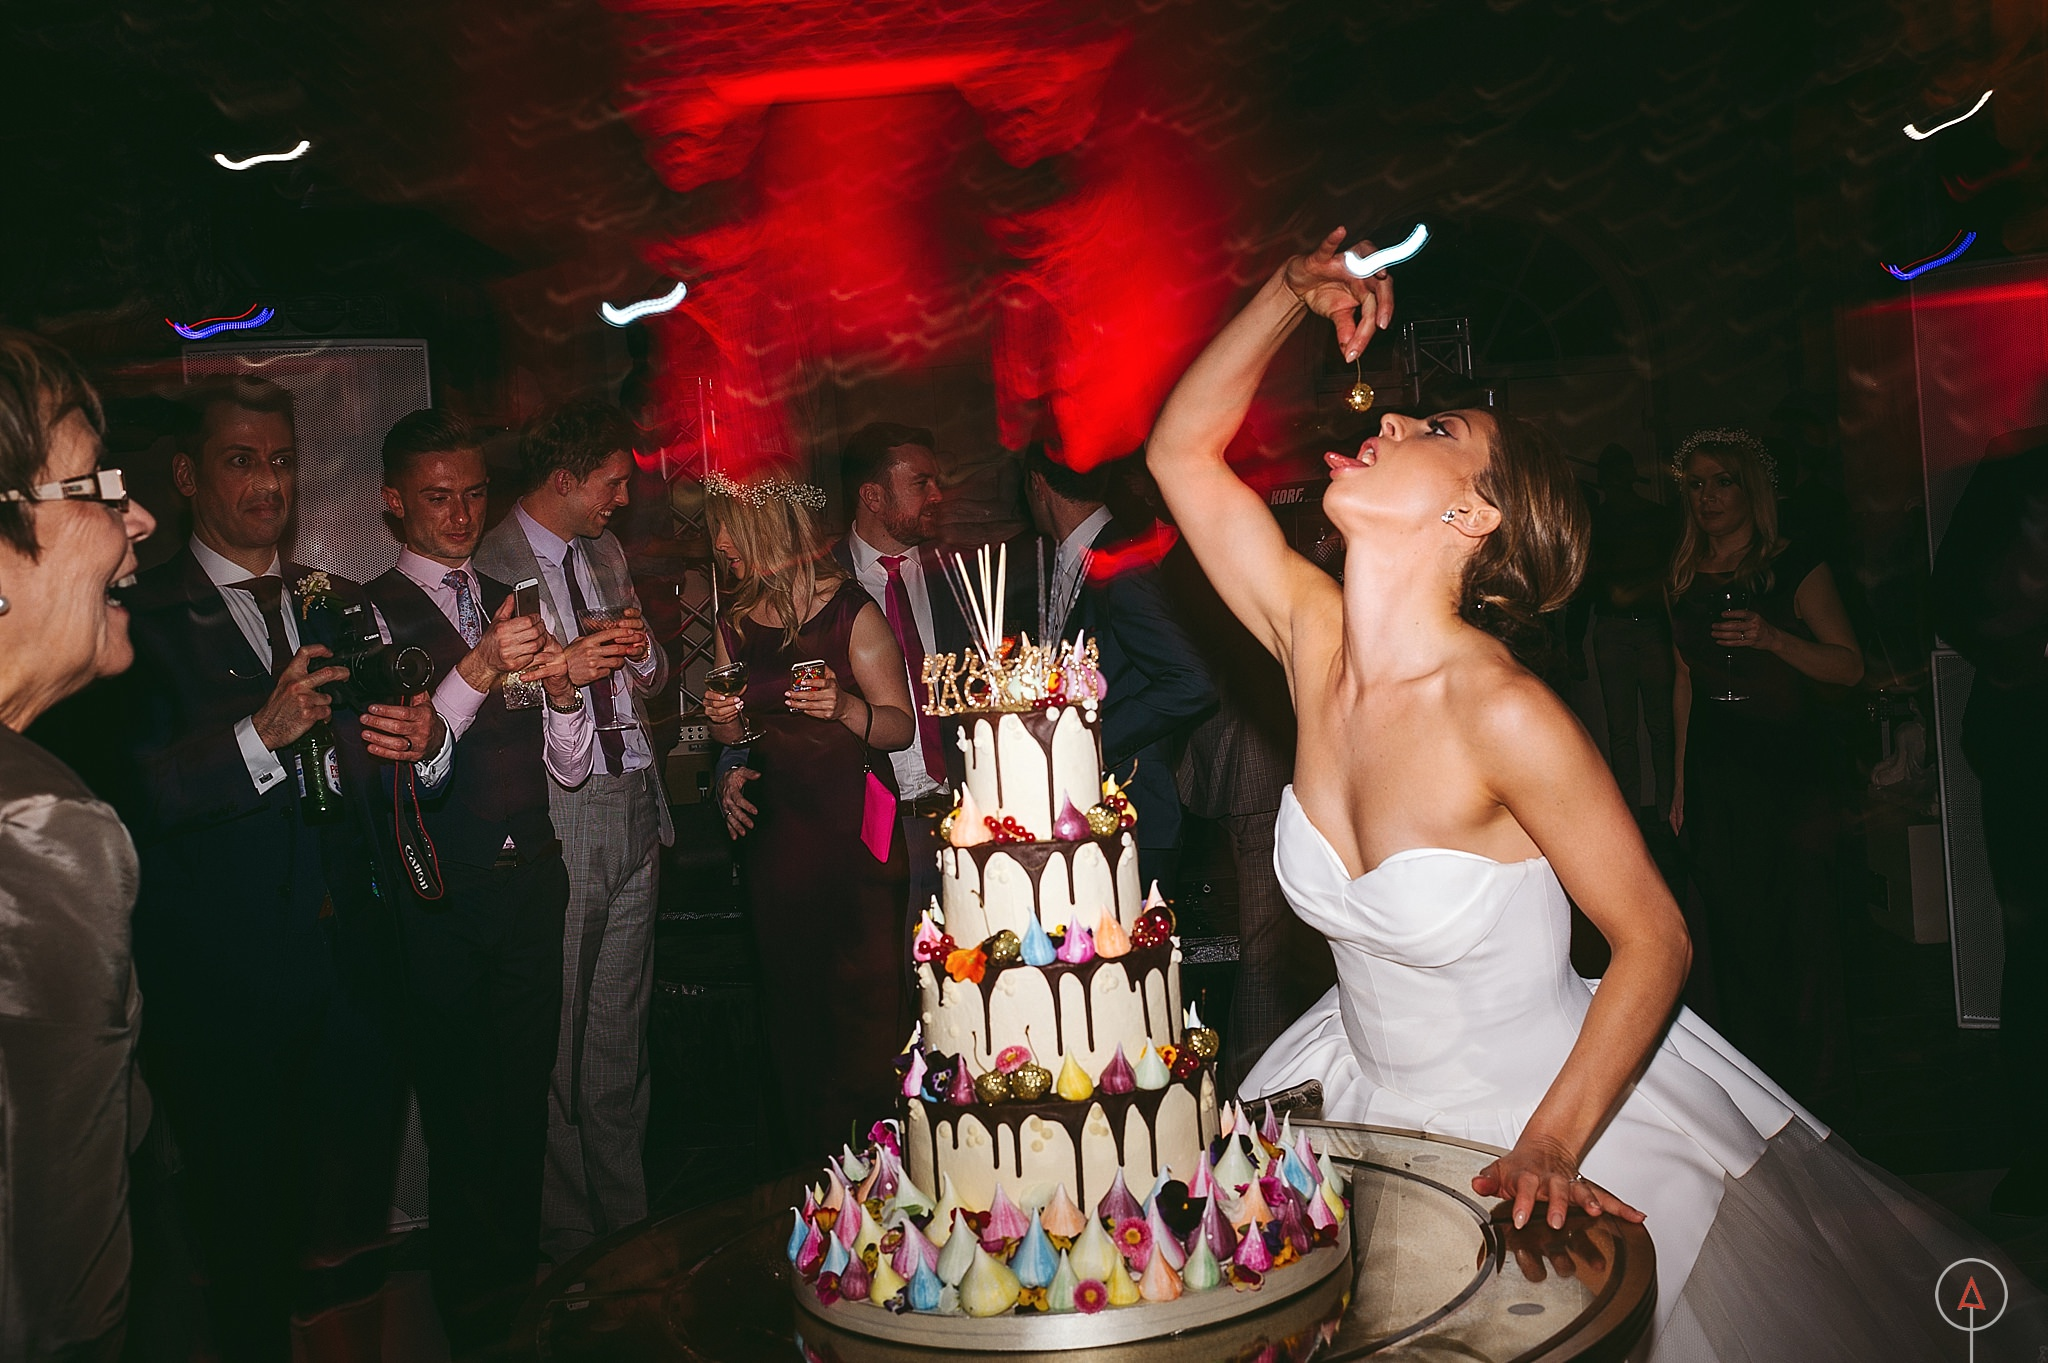 cardiff-wedding-photographer-aga-tomaszek_0308